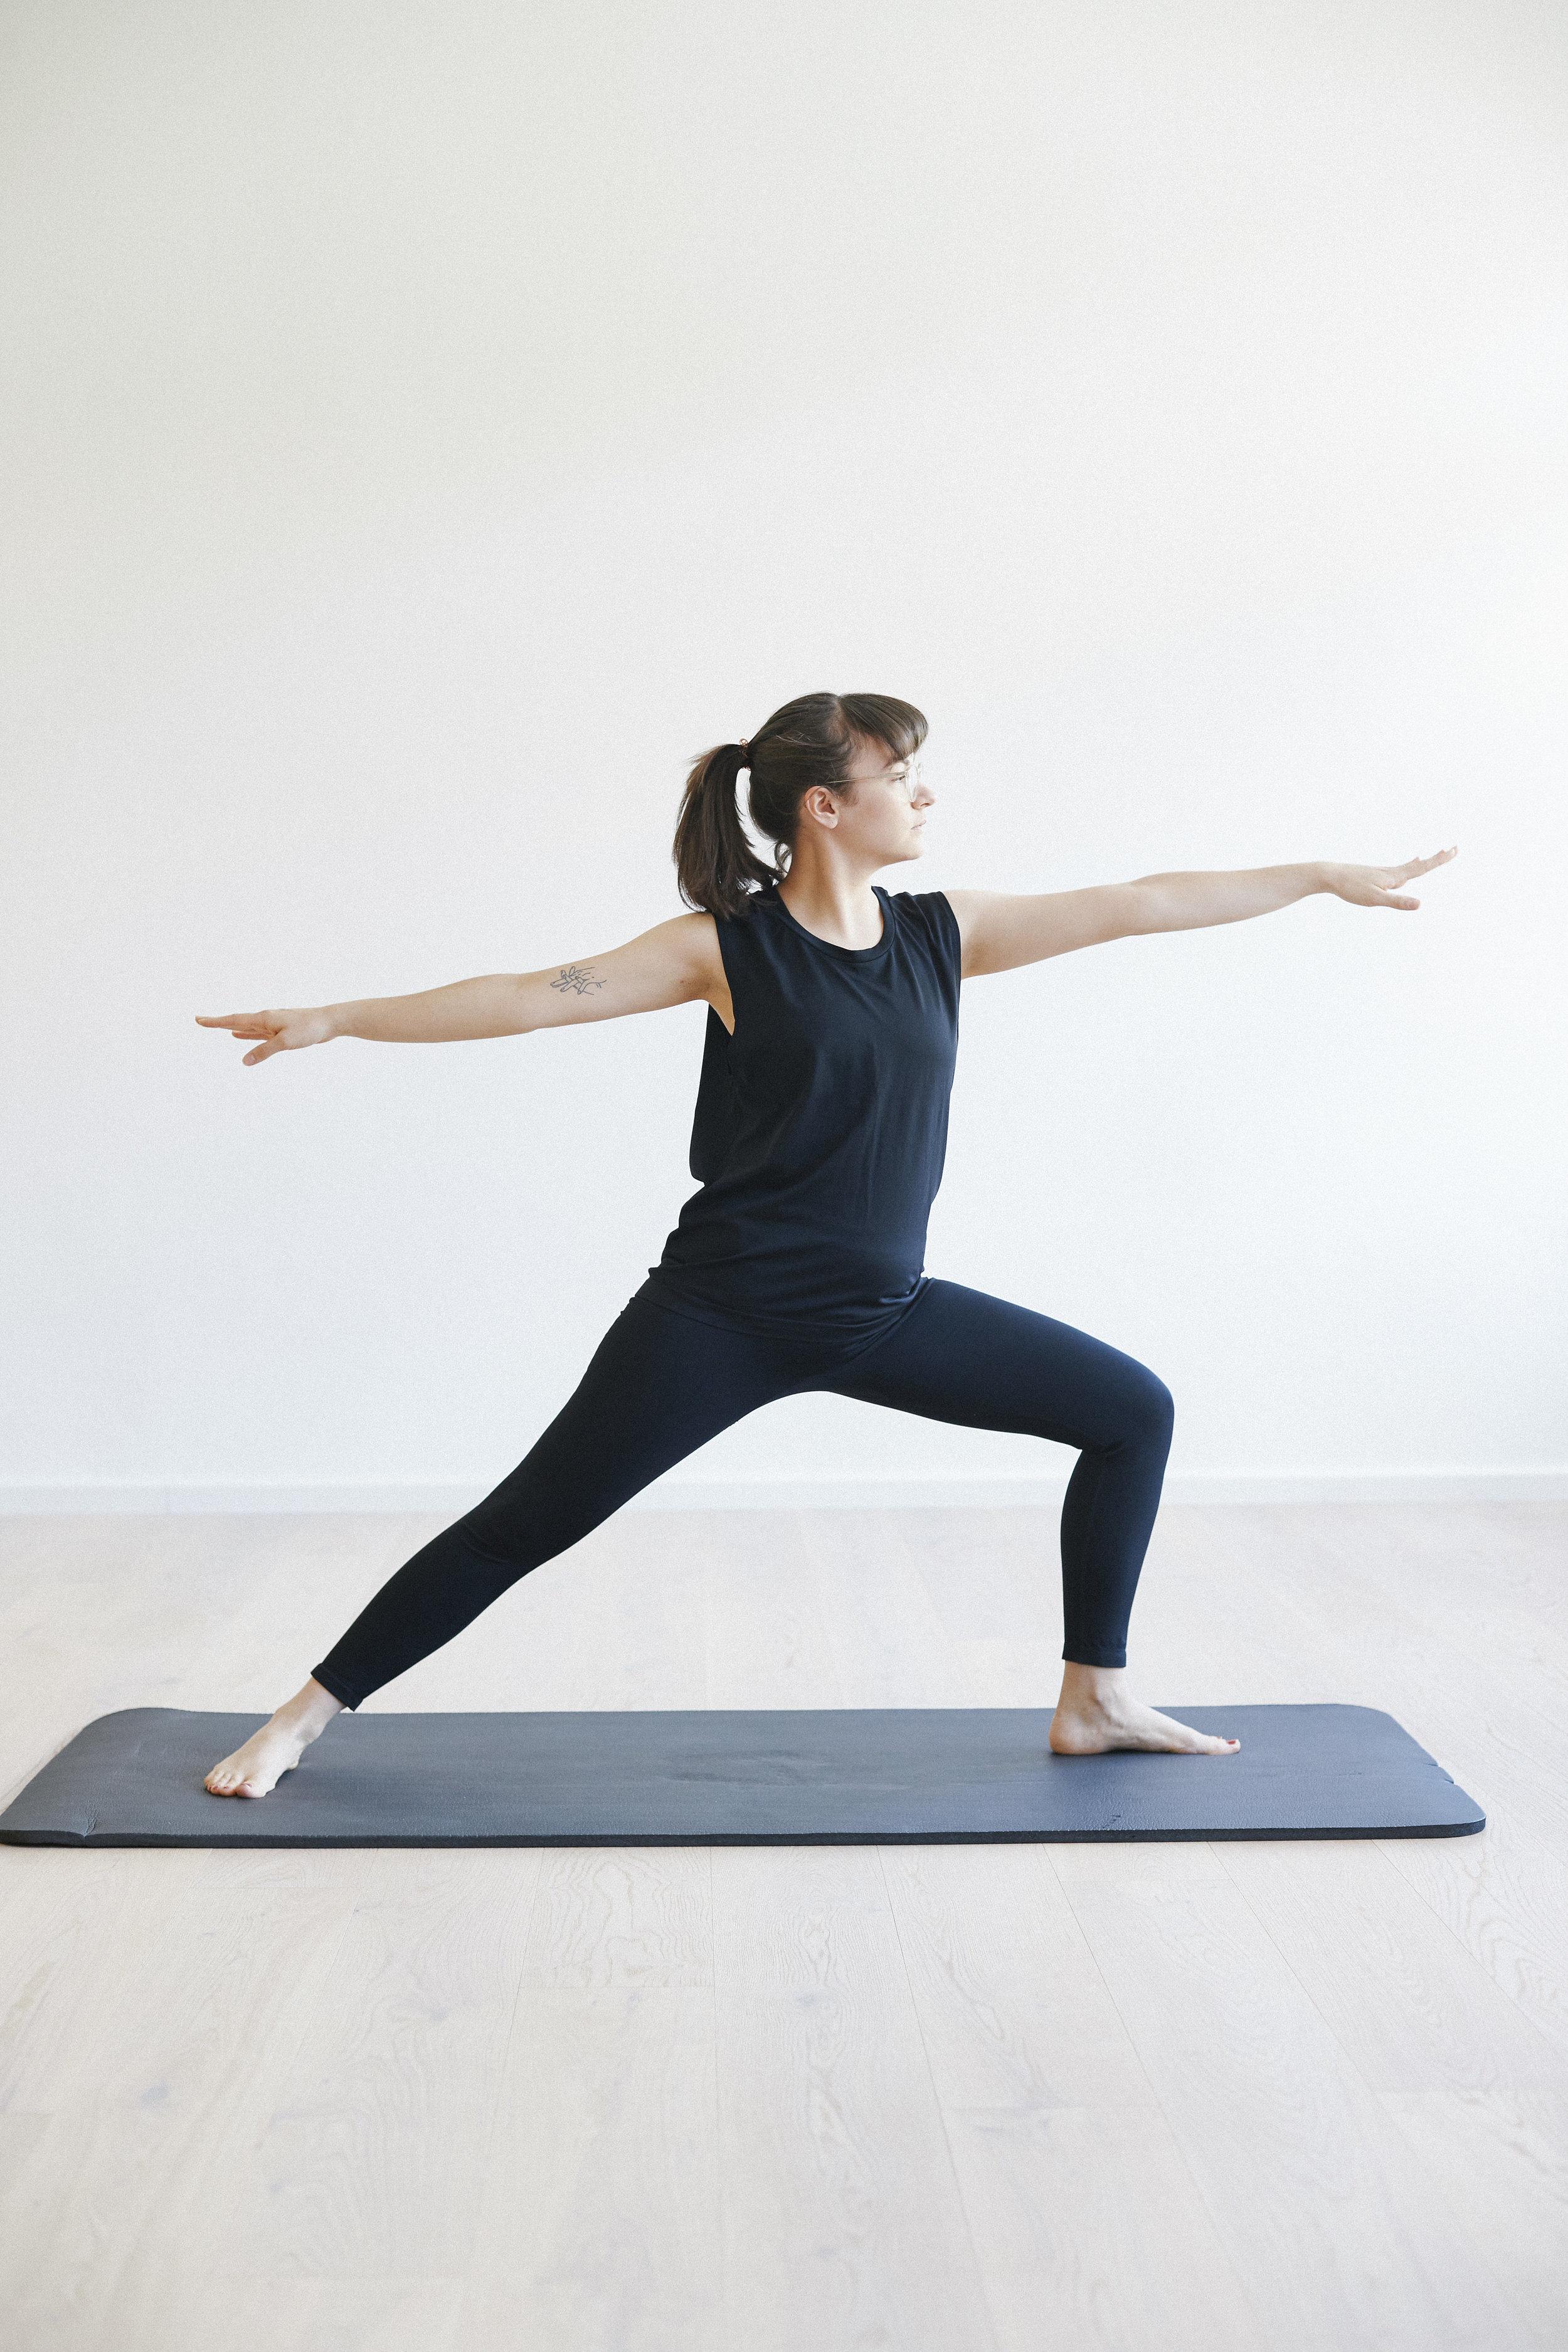 2019_06_07_Organic Basicy Yoga_009_VSCO.JPG